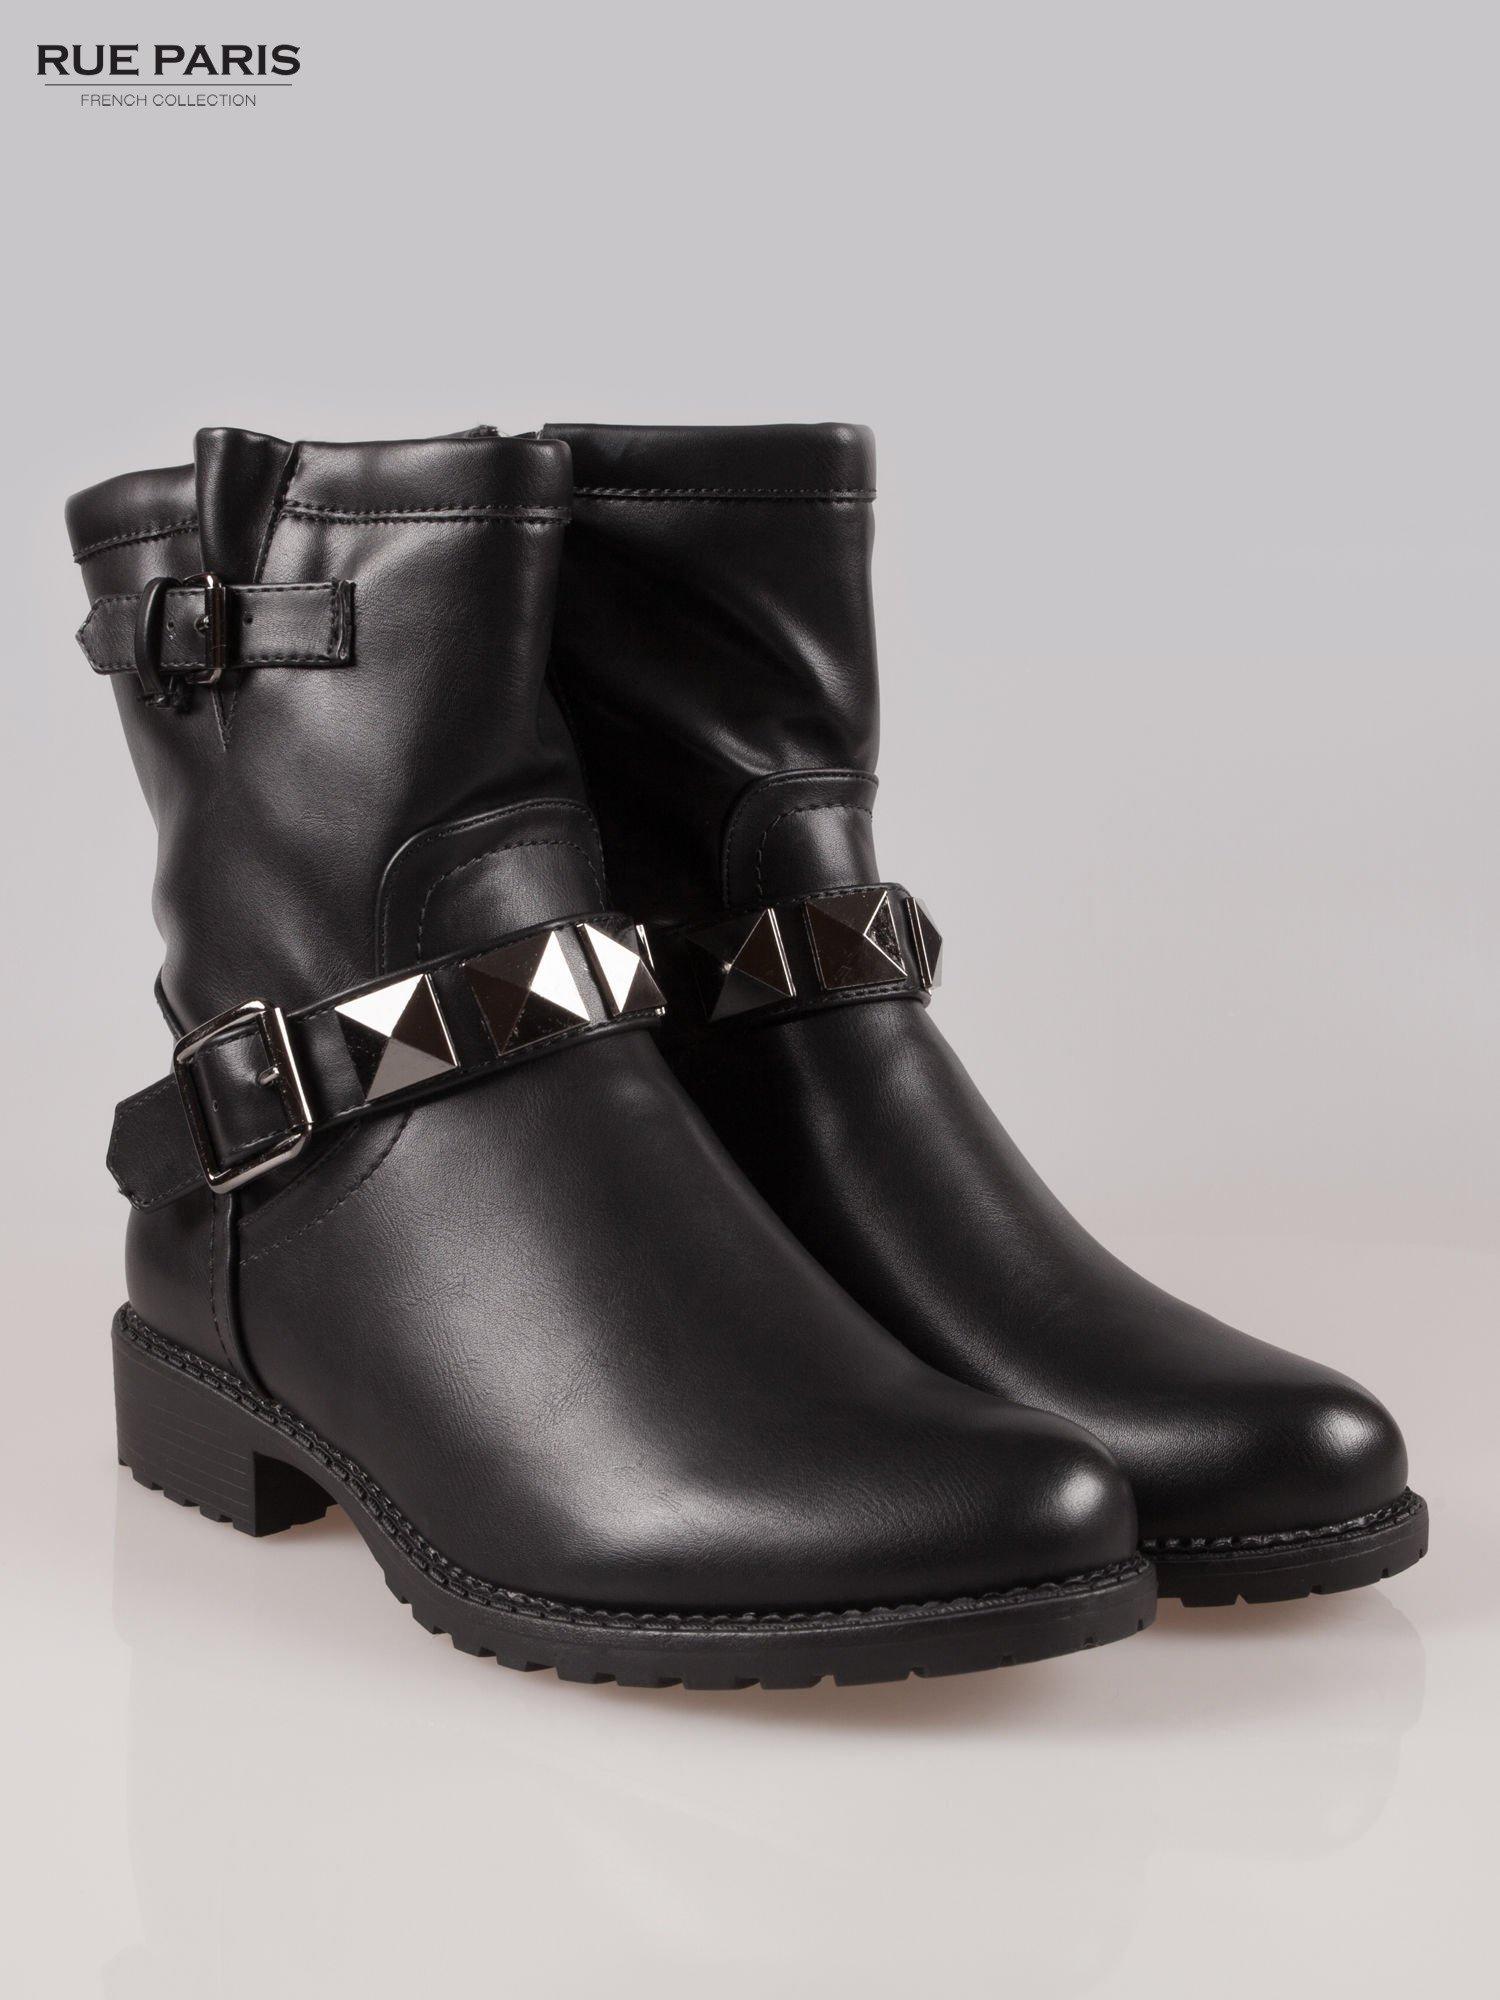 Czarne botki biker boots z klamerkami                                  zdj.                                  2